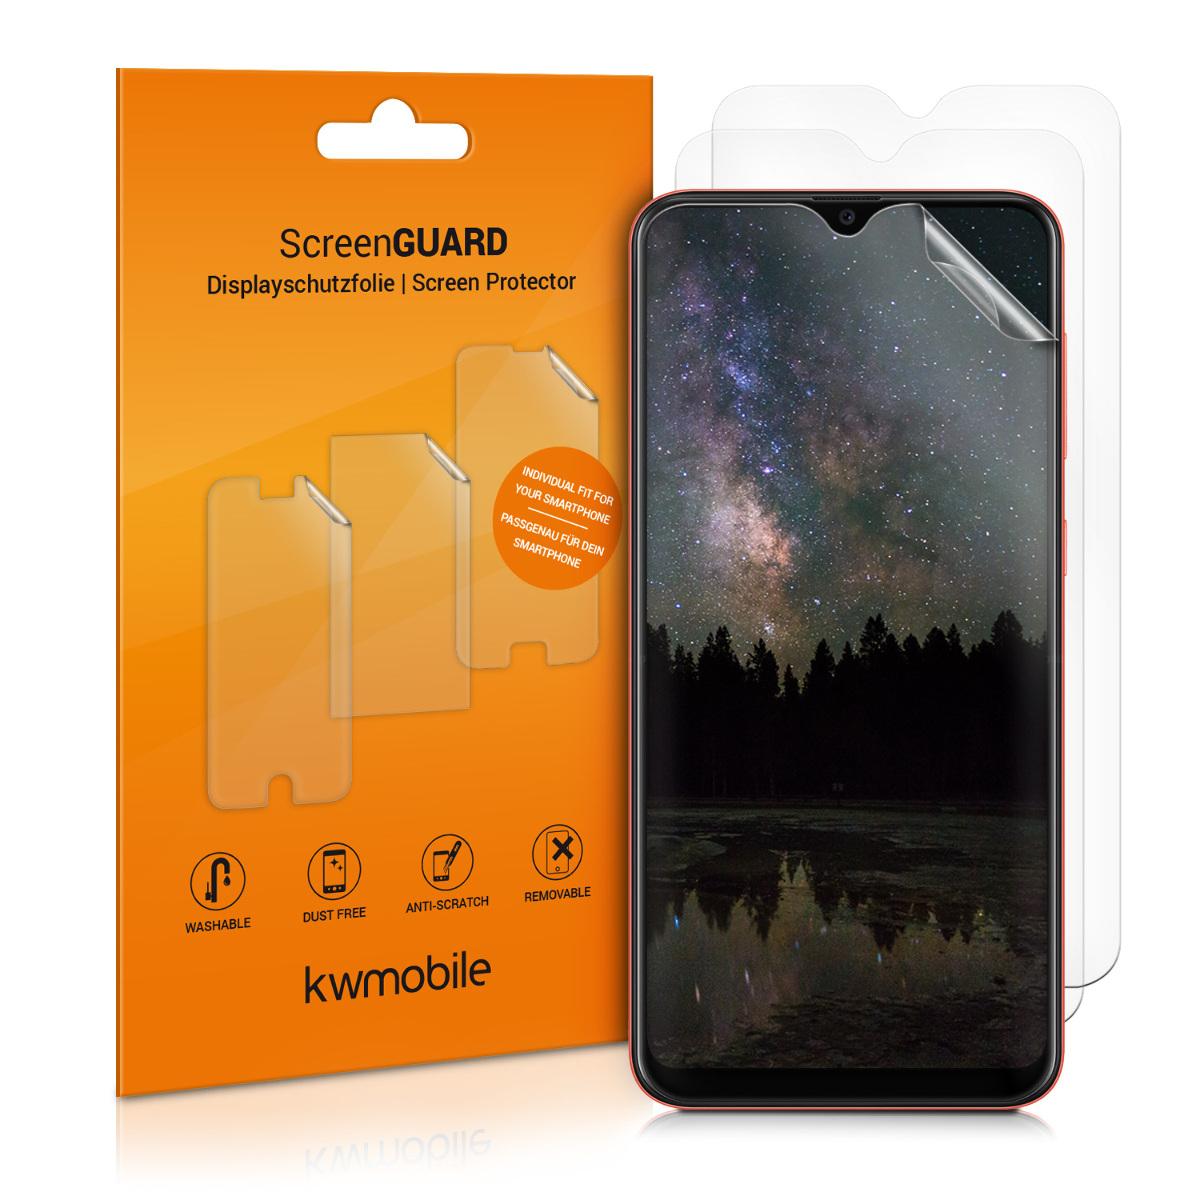 3x folie na display / screenprotector pro Samsung Galaxy A20